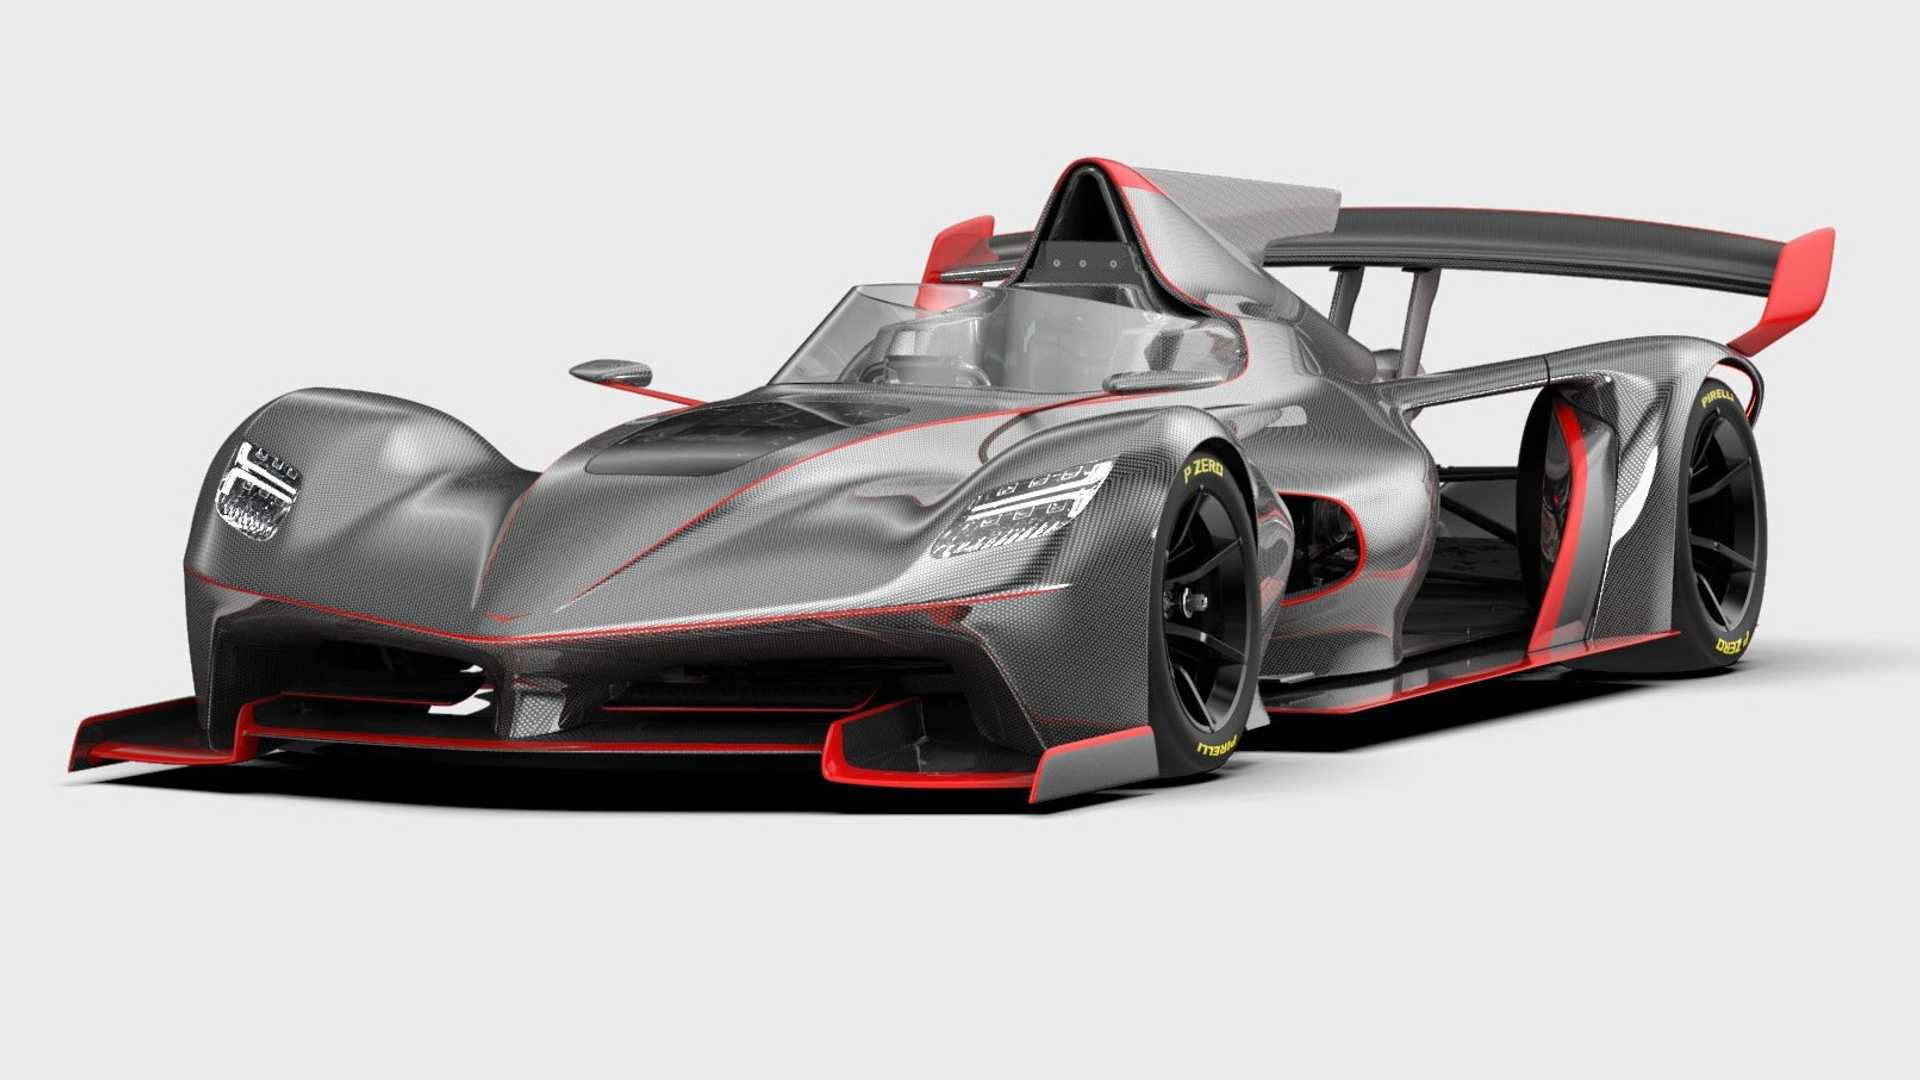 Vandal Cars One track racer